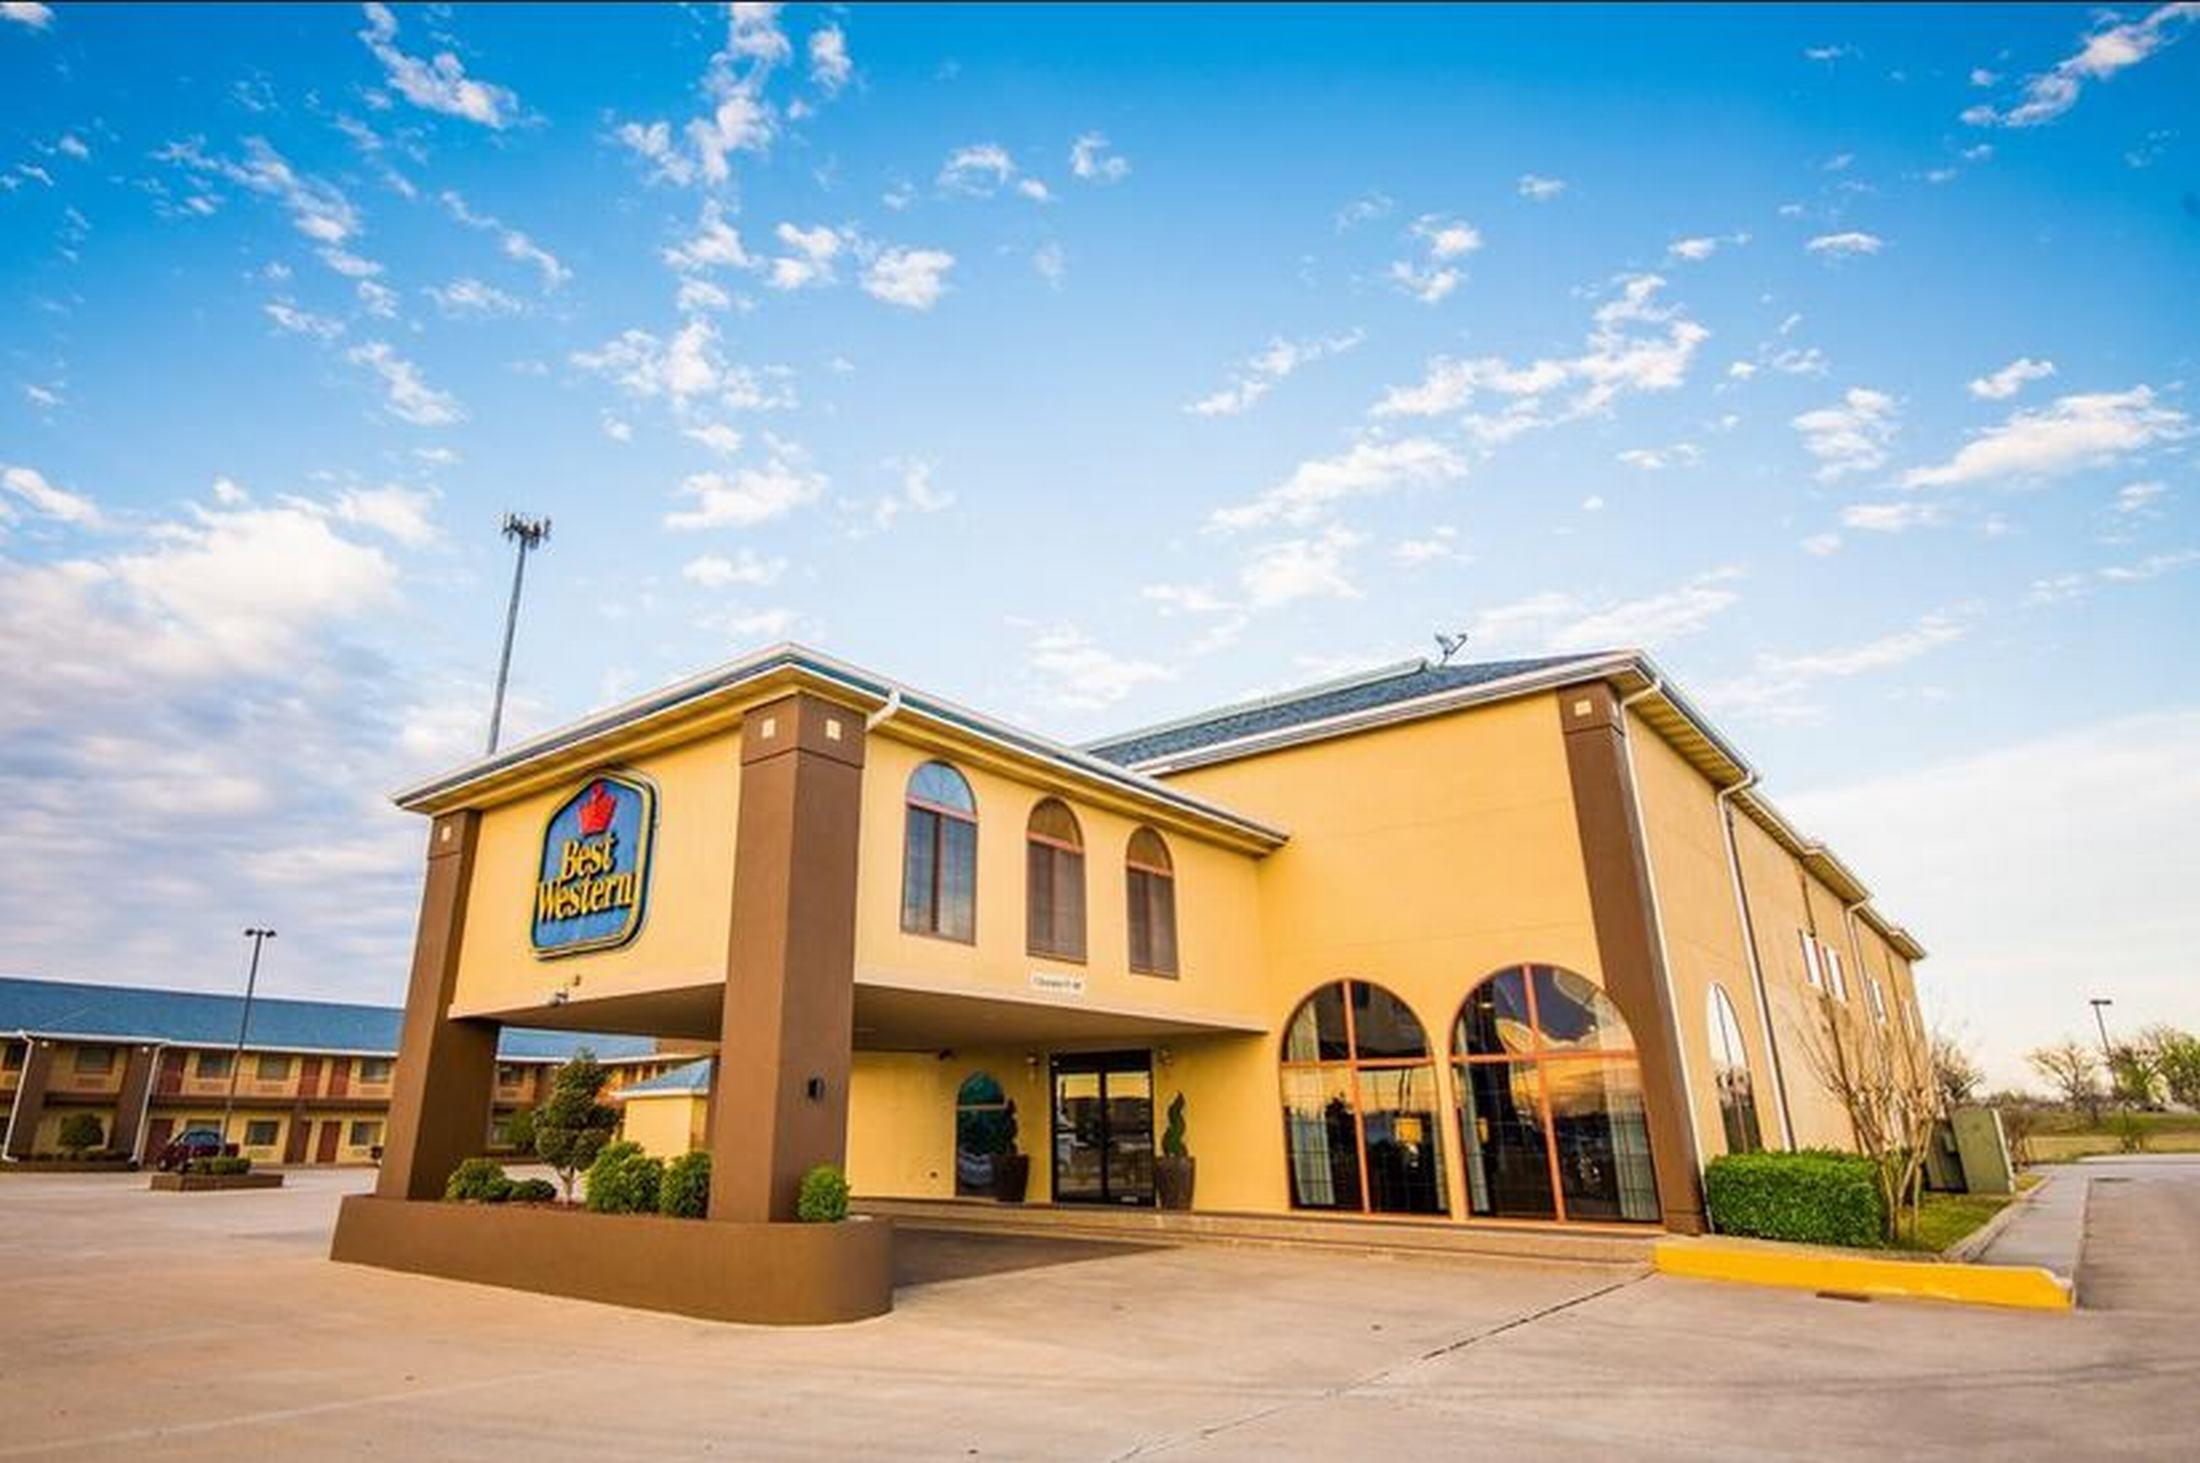 Quality Inn & Suites Owasso, Tulsa